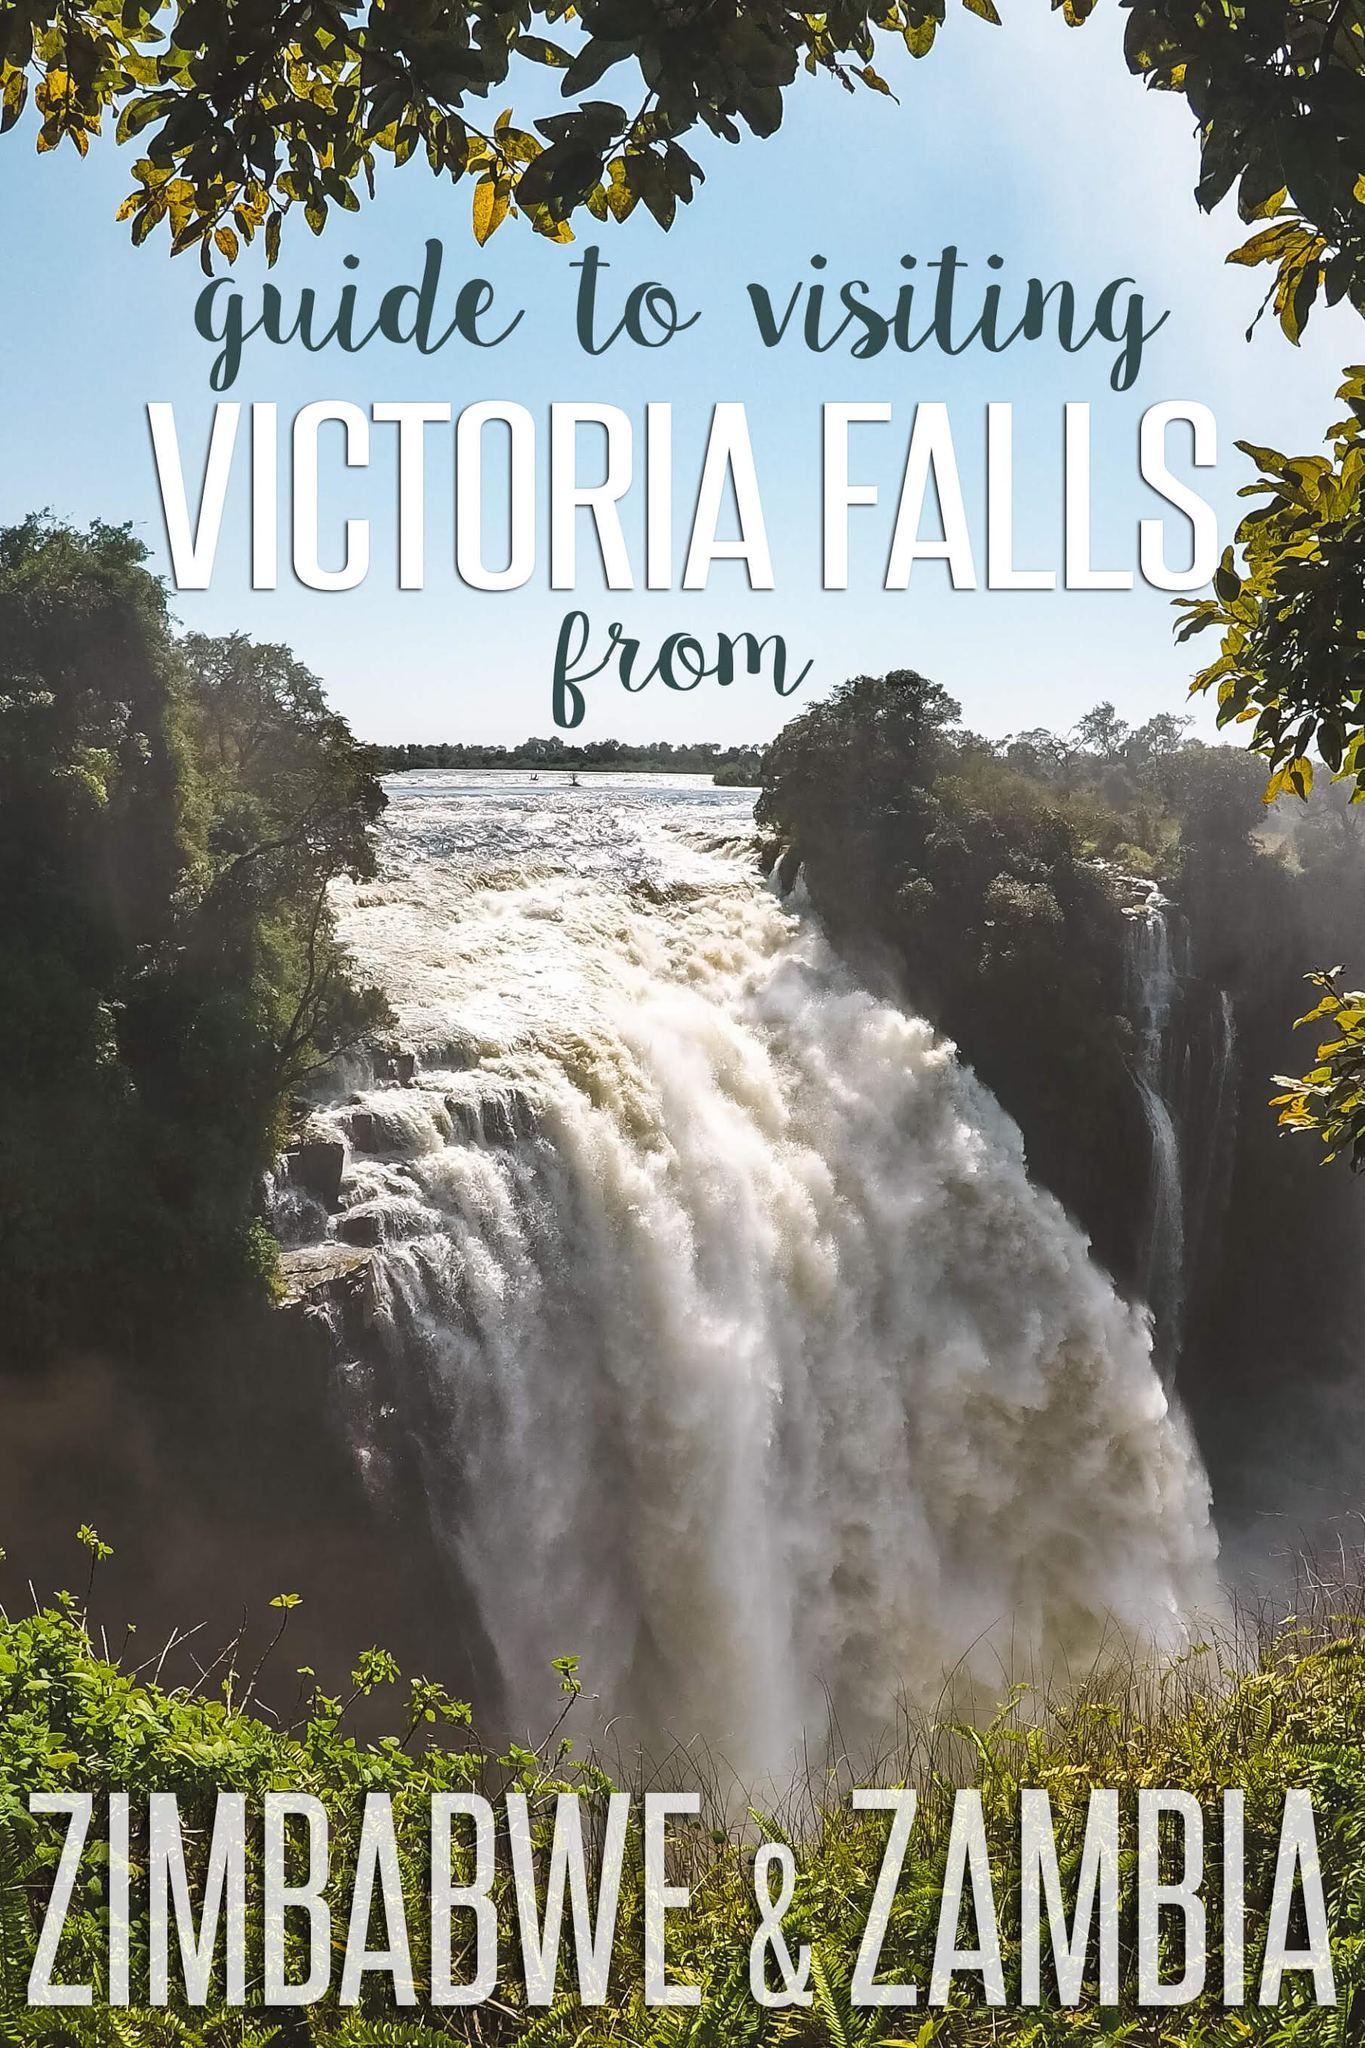 Visiting Victoria Falls from Zimbabwe and Zambia